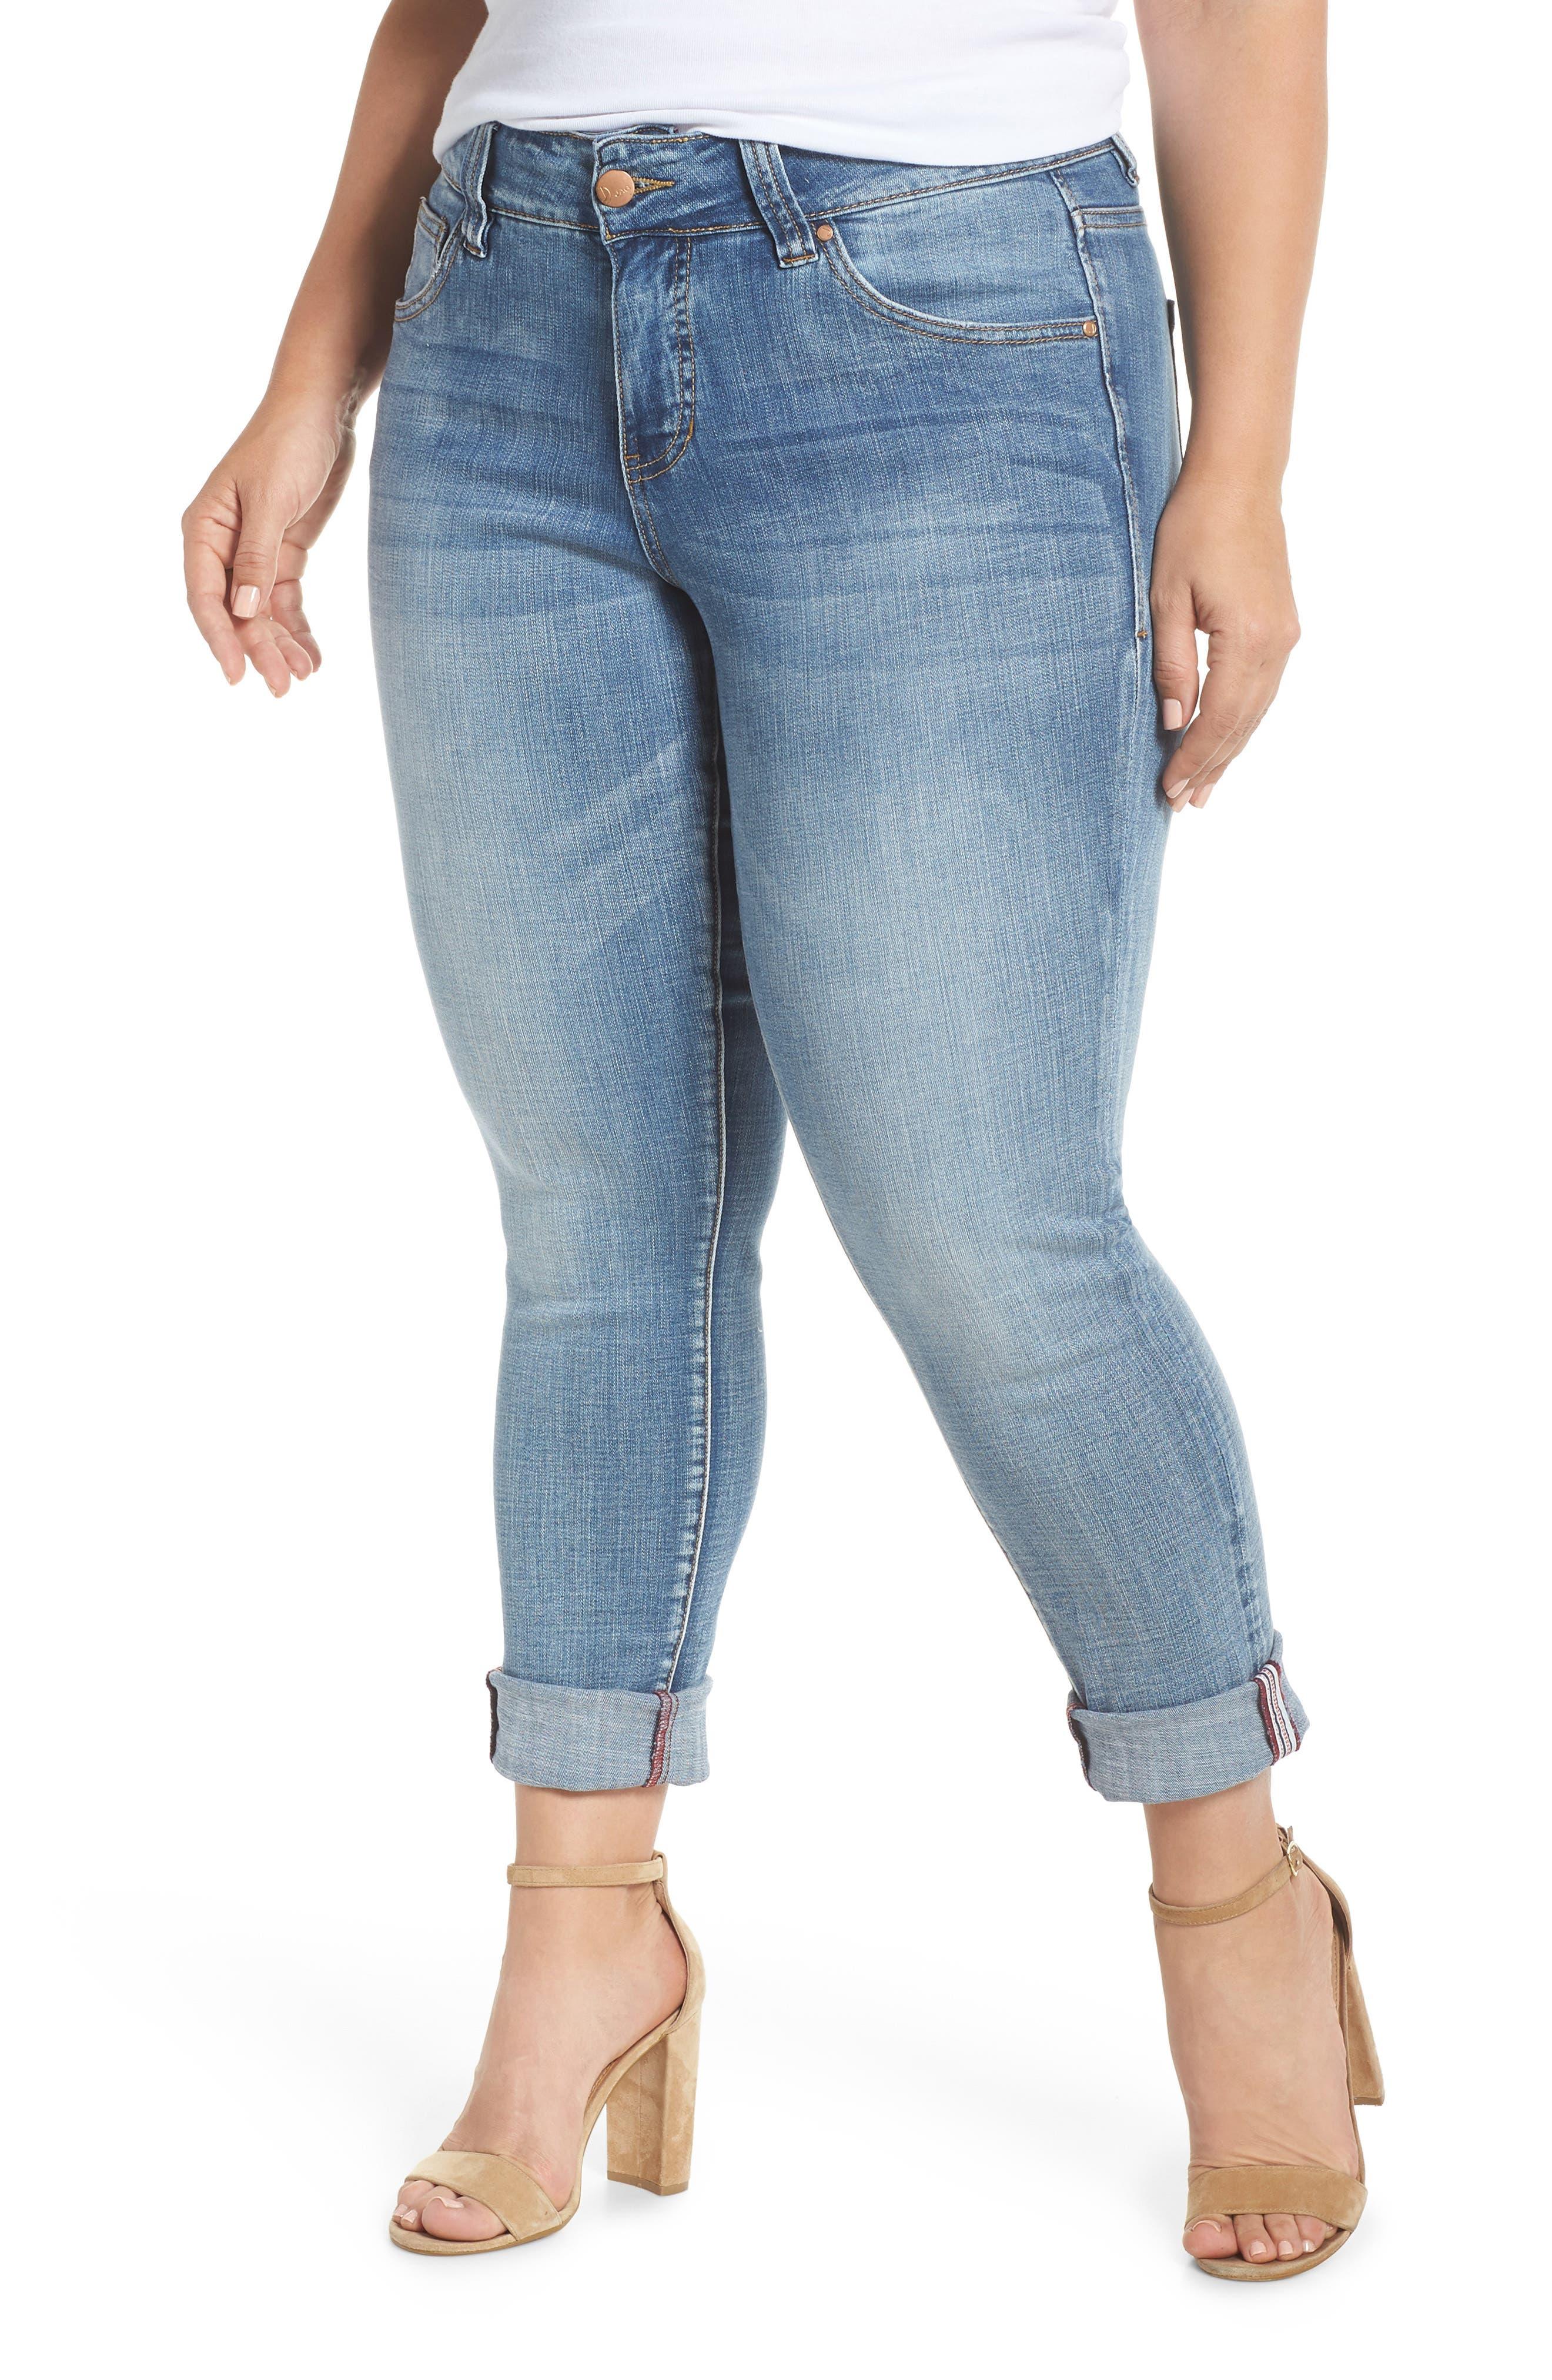 Carter Girlfriend Jeans,                         Main,                         color, MED INDIGO